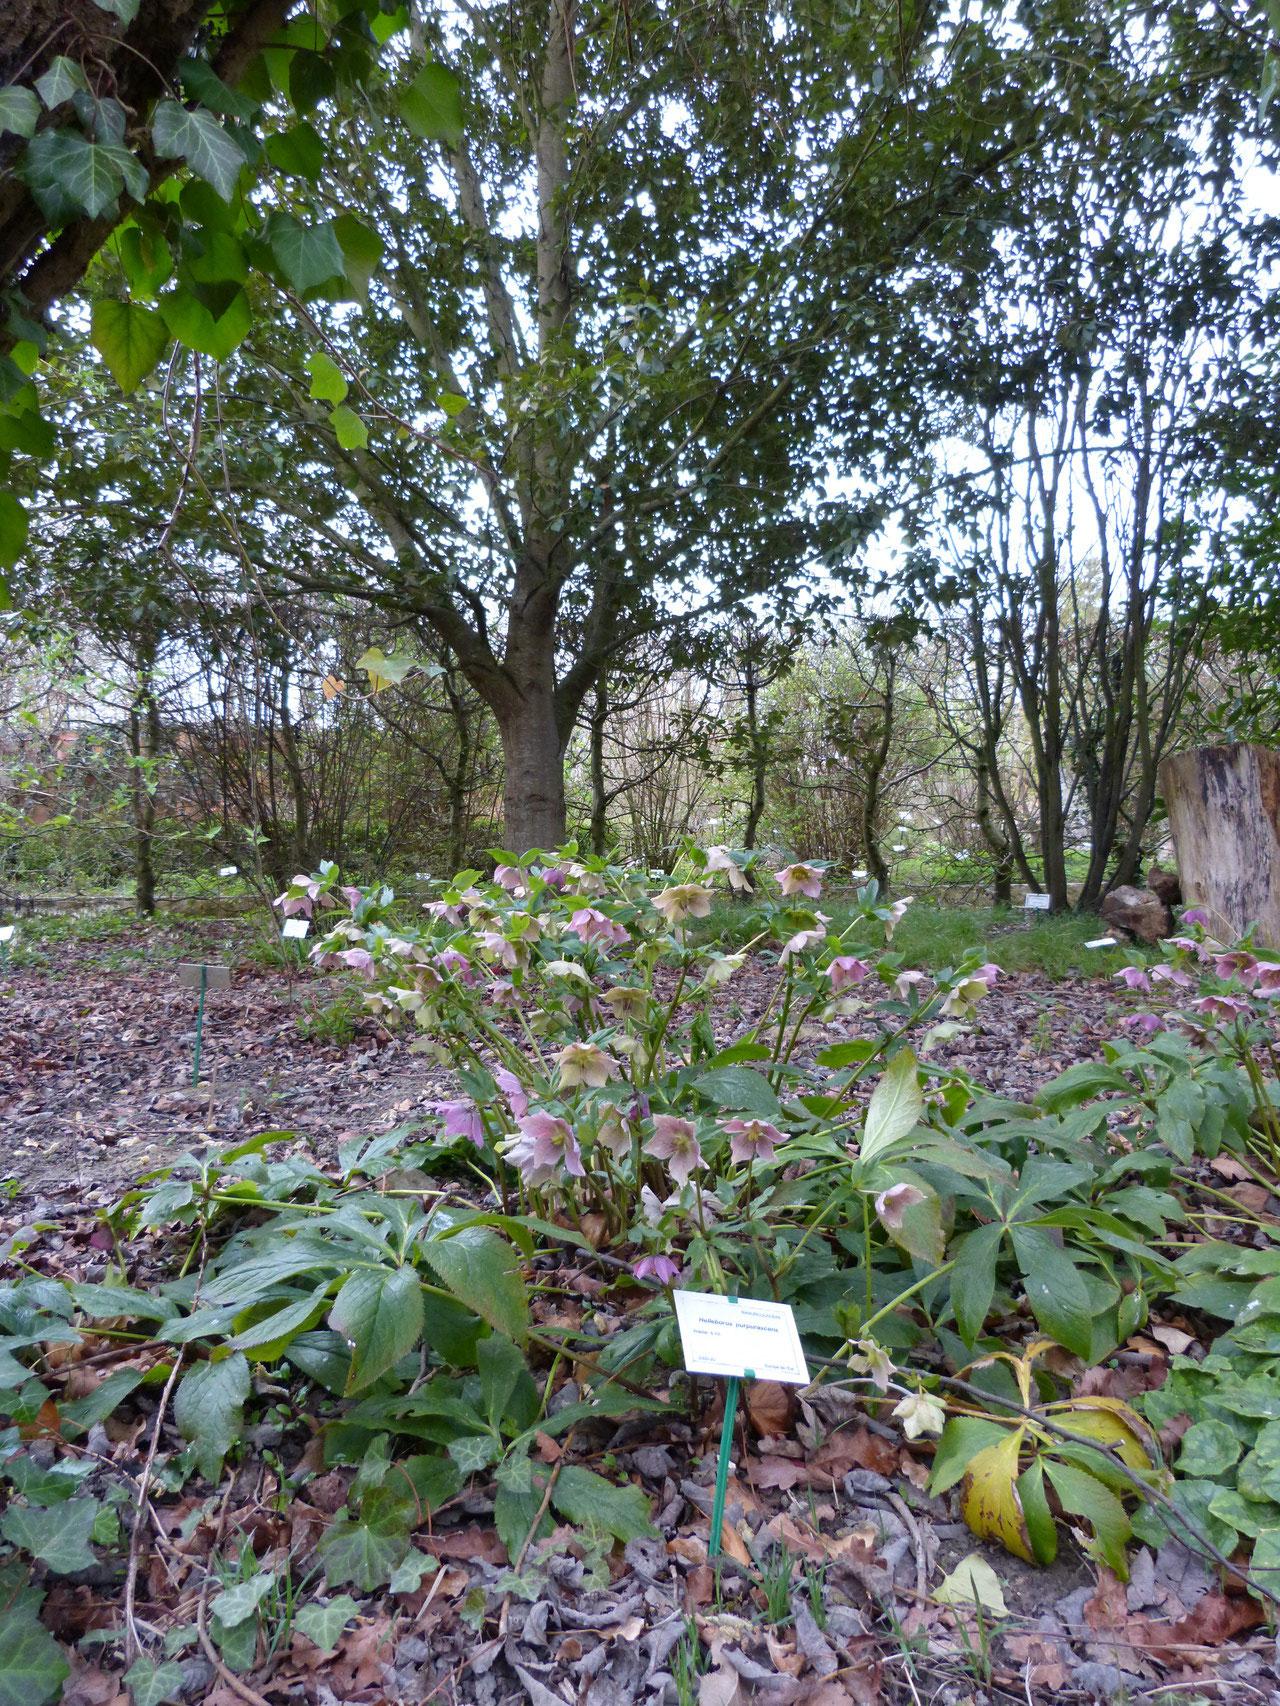 jardin botanique de Marnay sur Seine, Nogentais